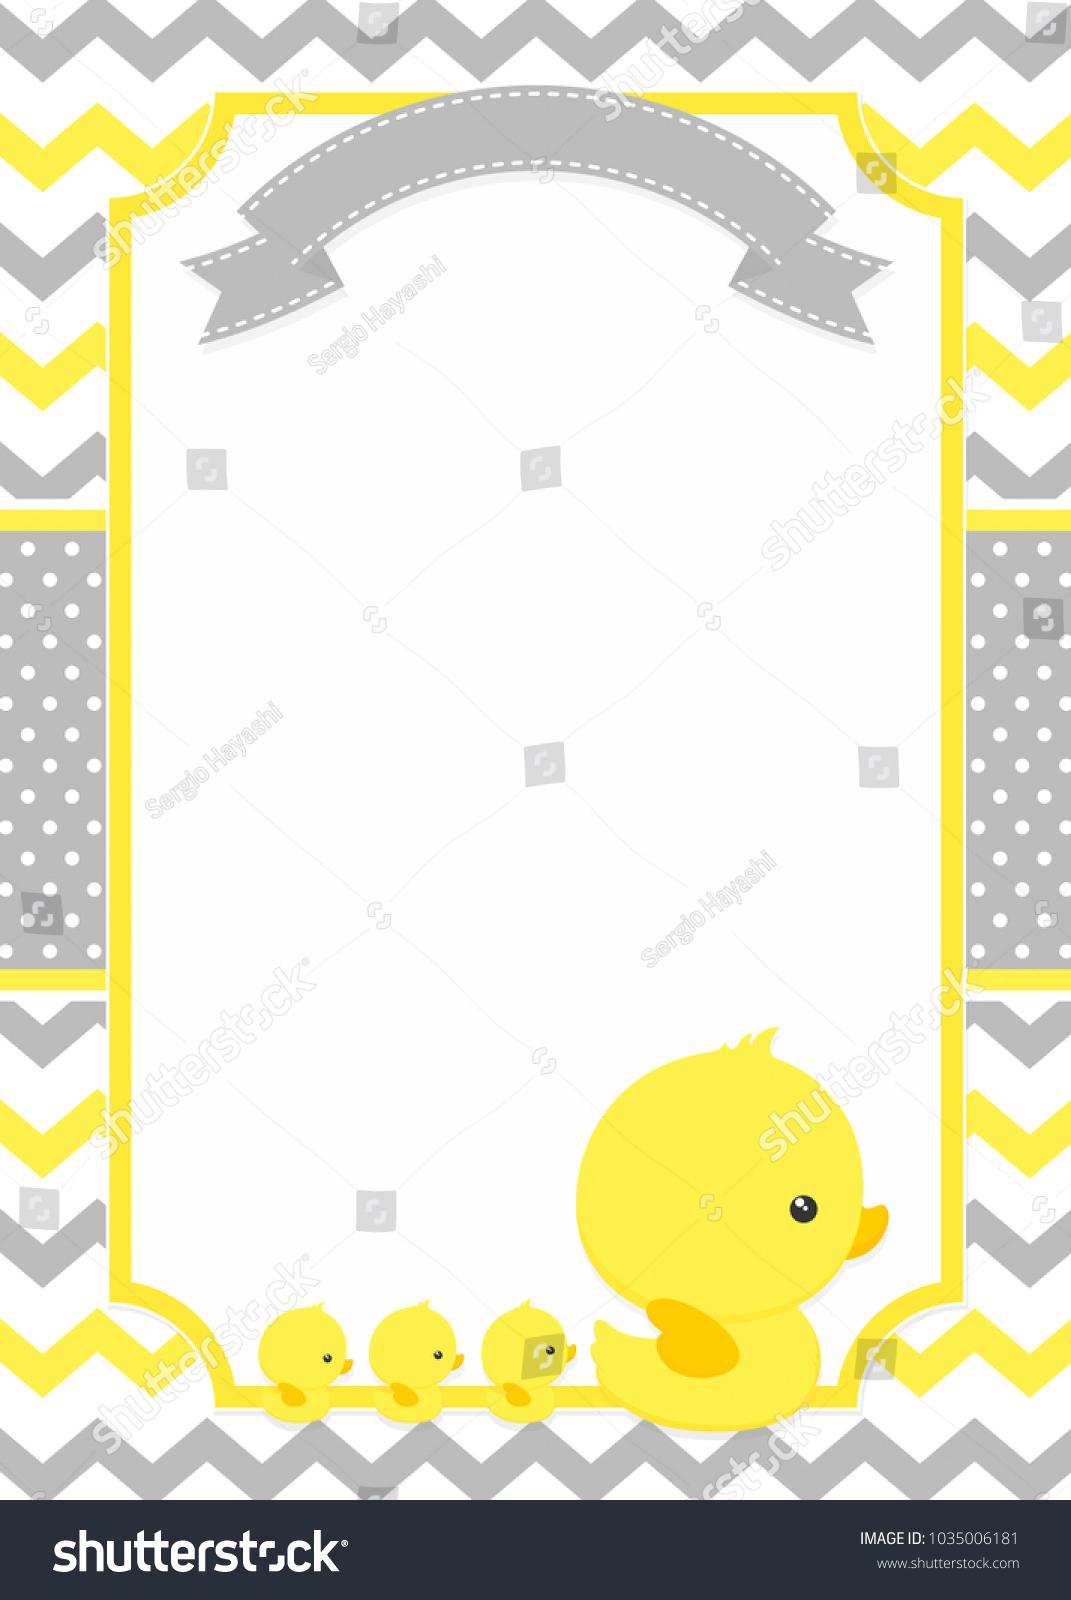 Baby shower invitation cute duck mom stock vector 1035006181 baby shower invitation with cute duck mom and baby ducks on chevron pattern and polka dots stopboris Images